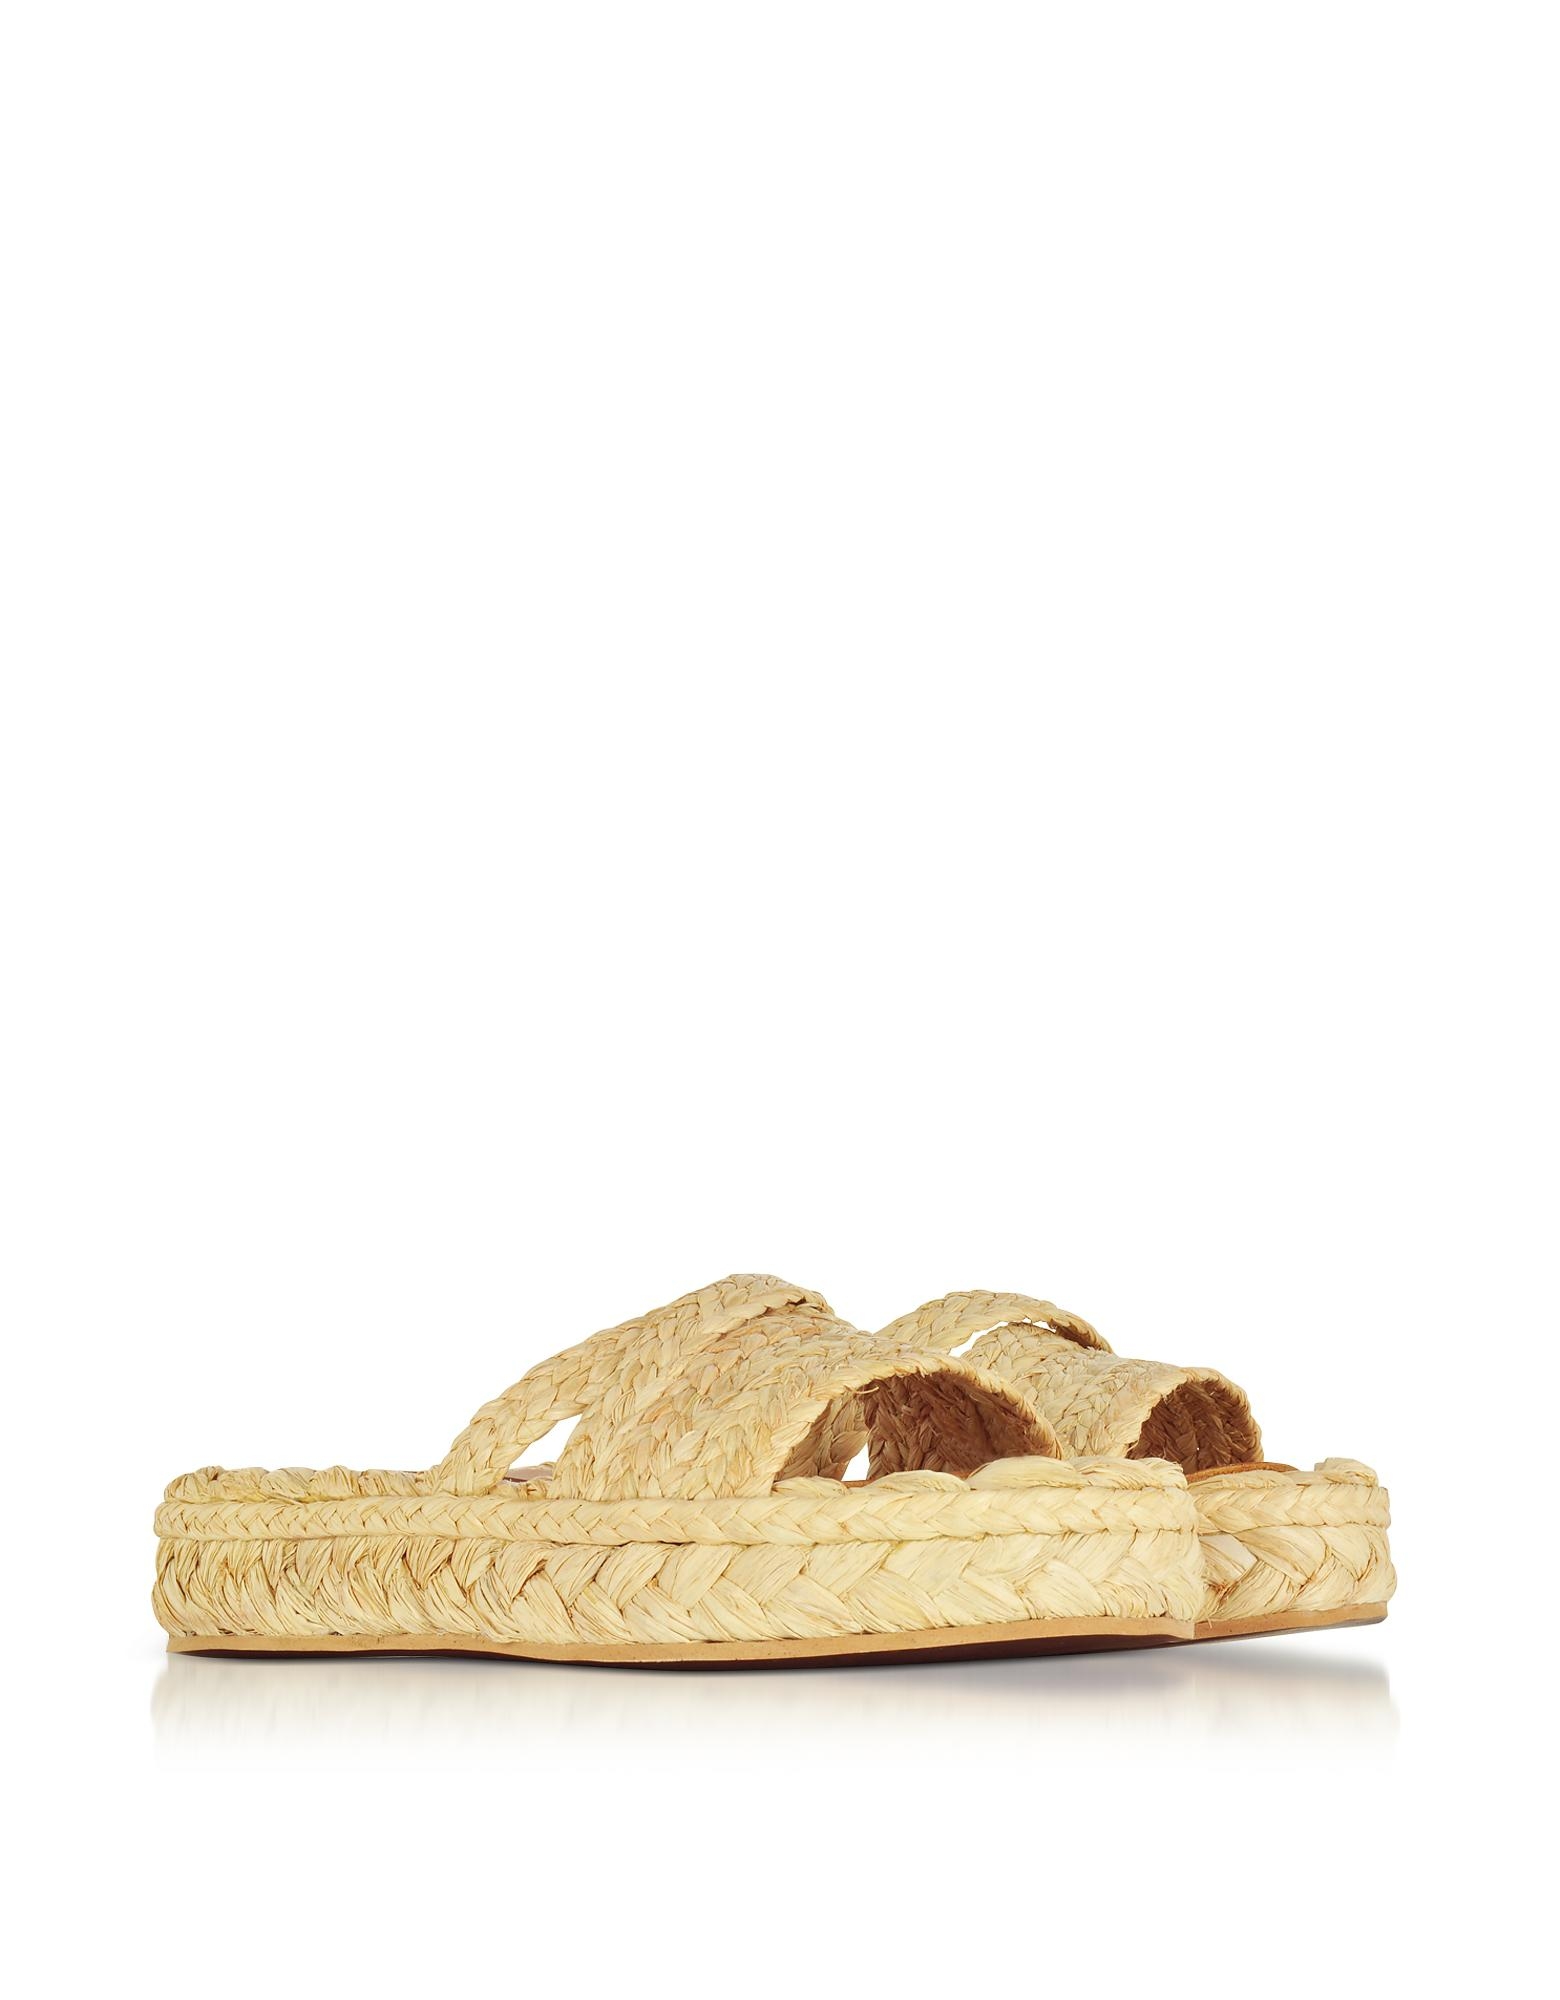 e418f7ebbbc Lyst - Robert Clergerie Idalie Natural Braided Raffia Flat Sandals ...